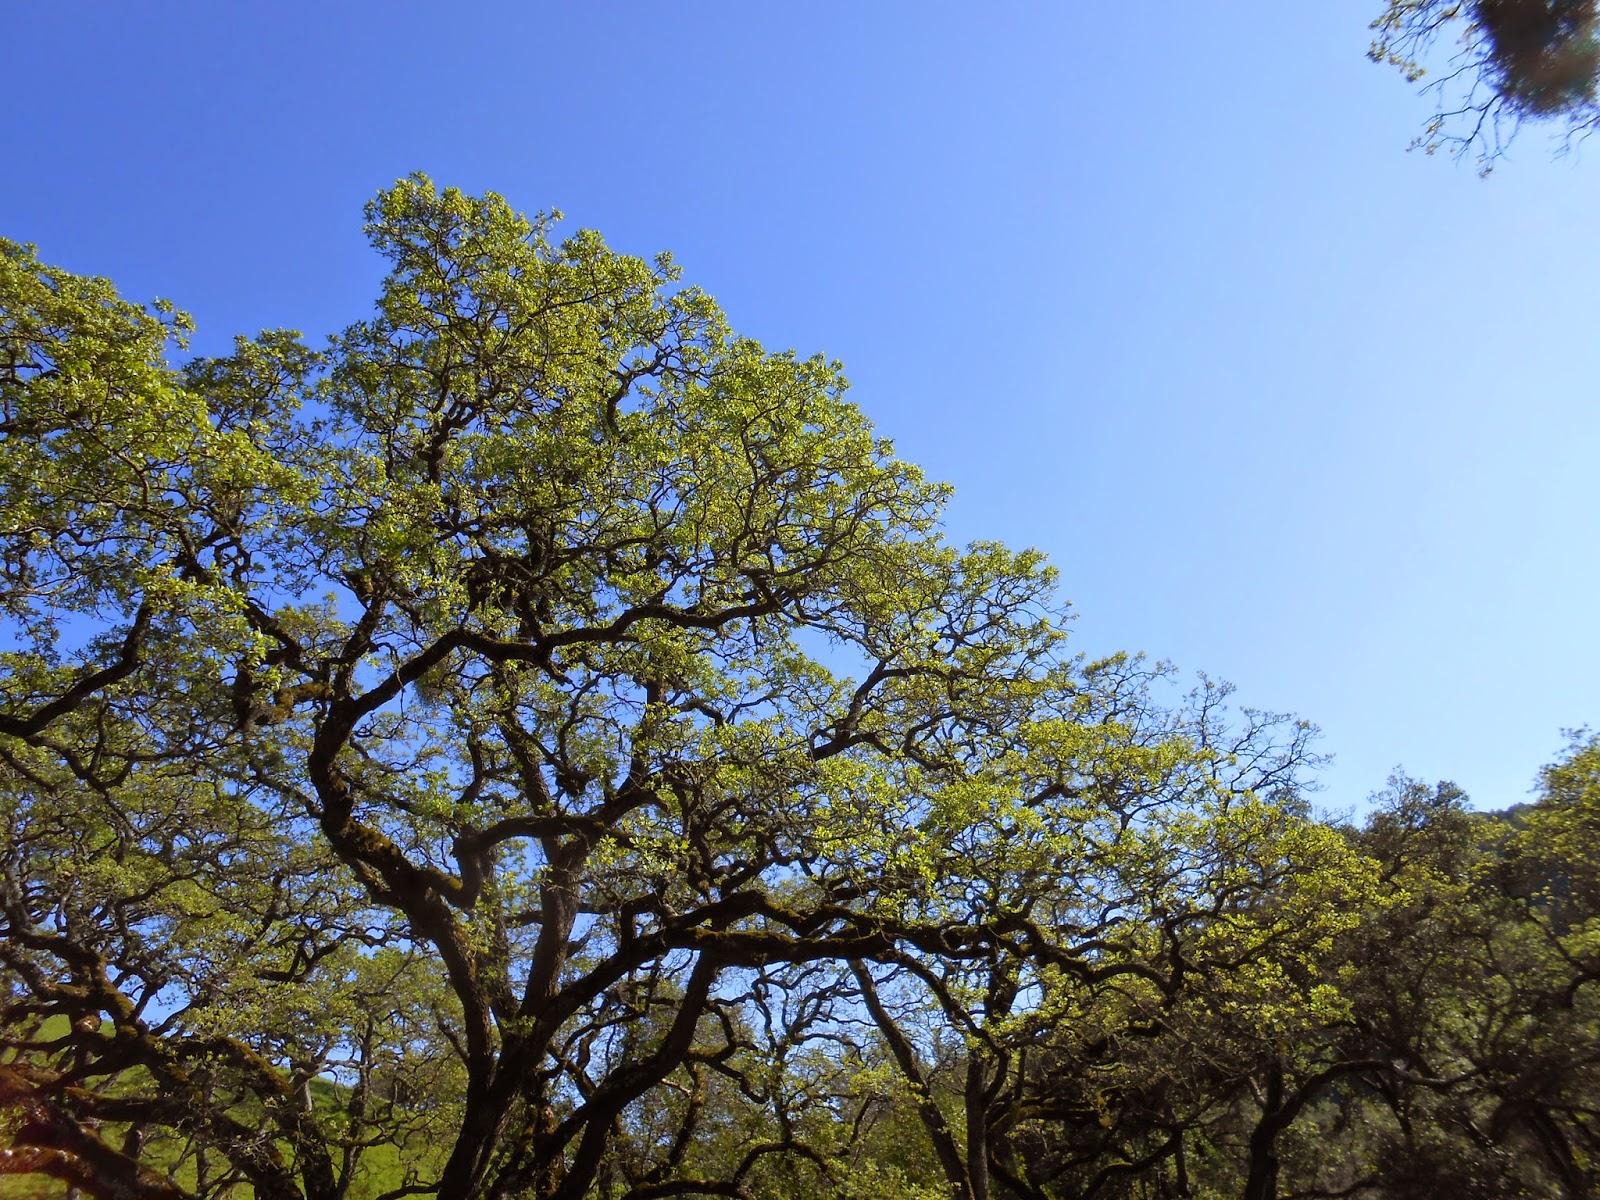 spiritual awakening, tree, briones regional park, new life, new buds, spiritual path